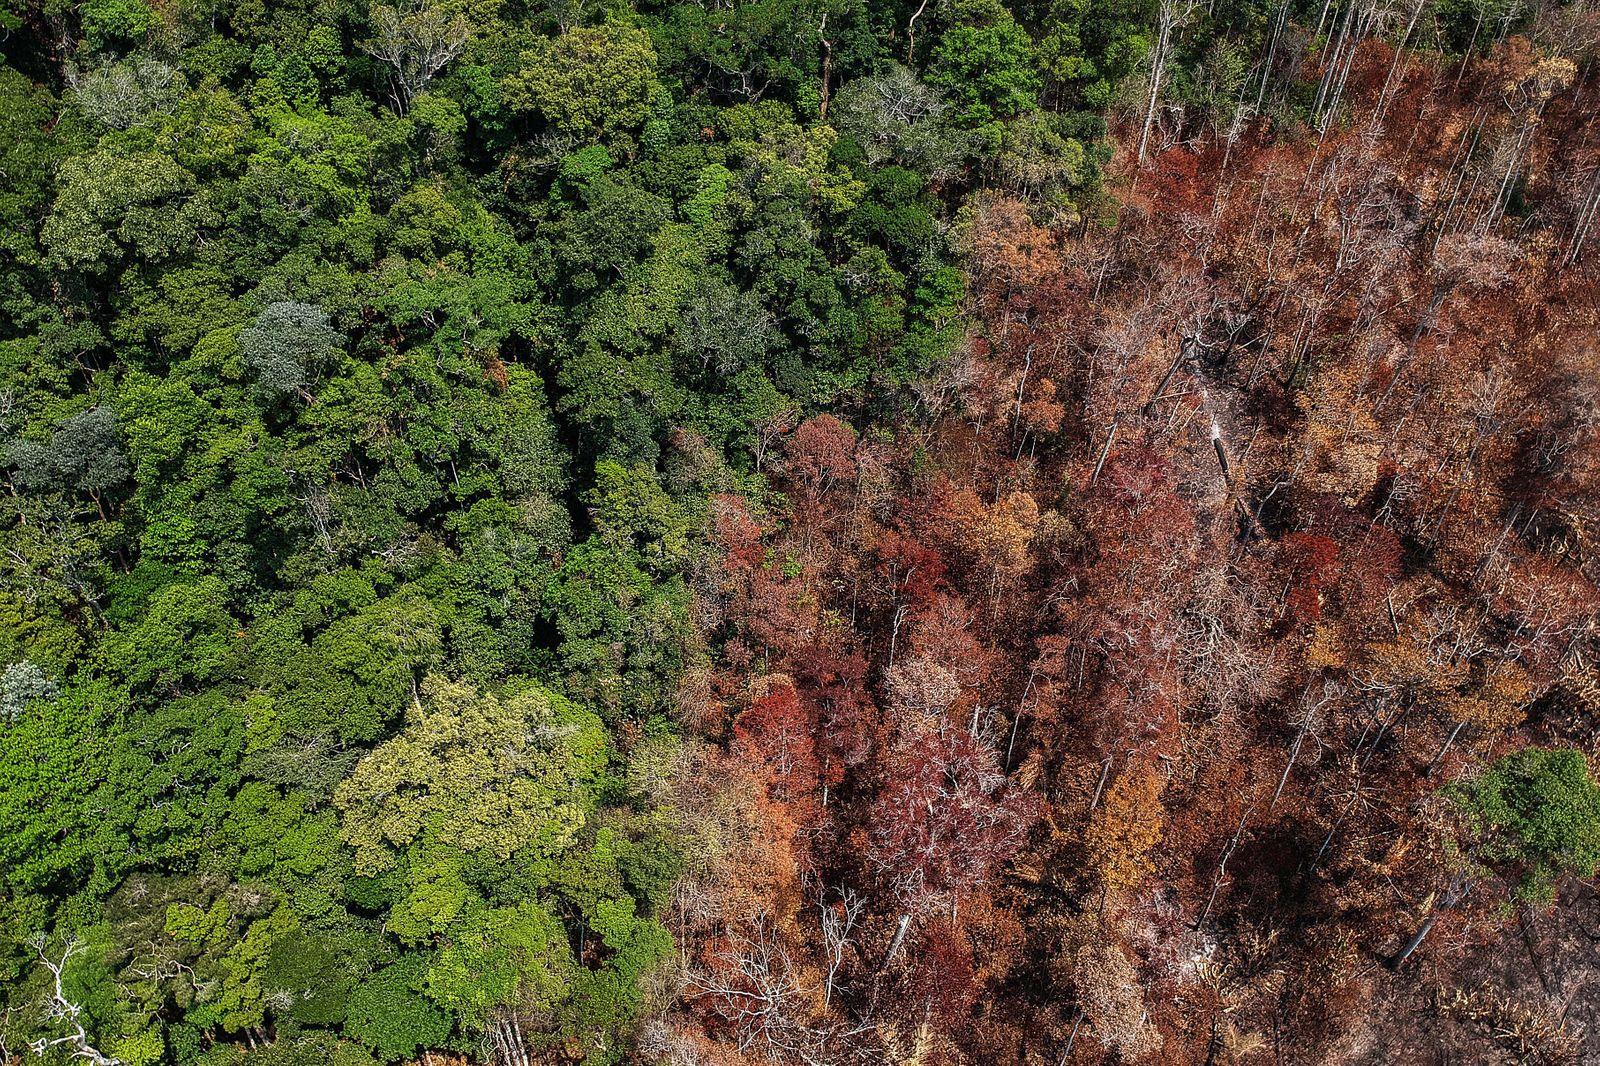 BRAZIL-TRANS-AMAZONIAN-HIGHWAY